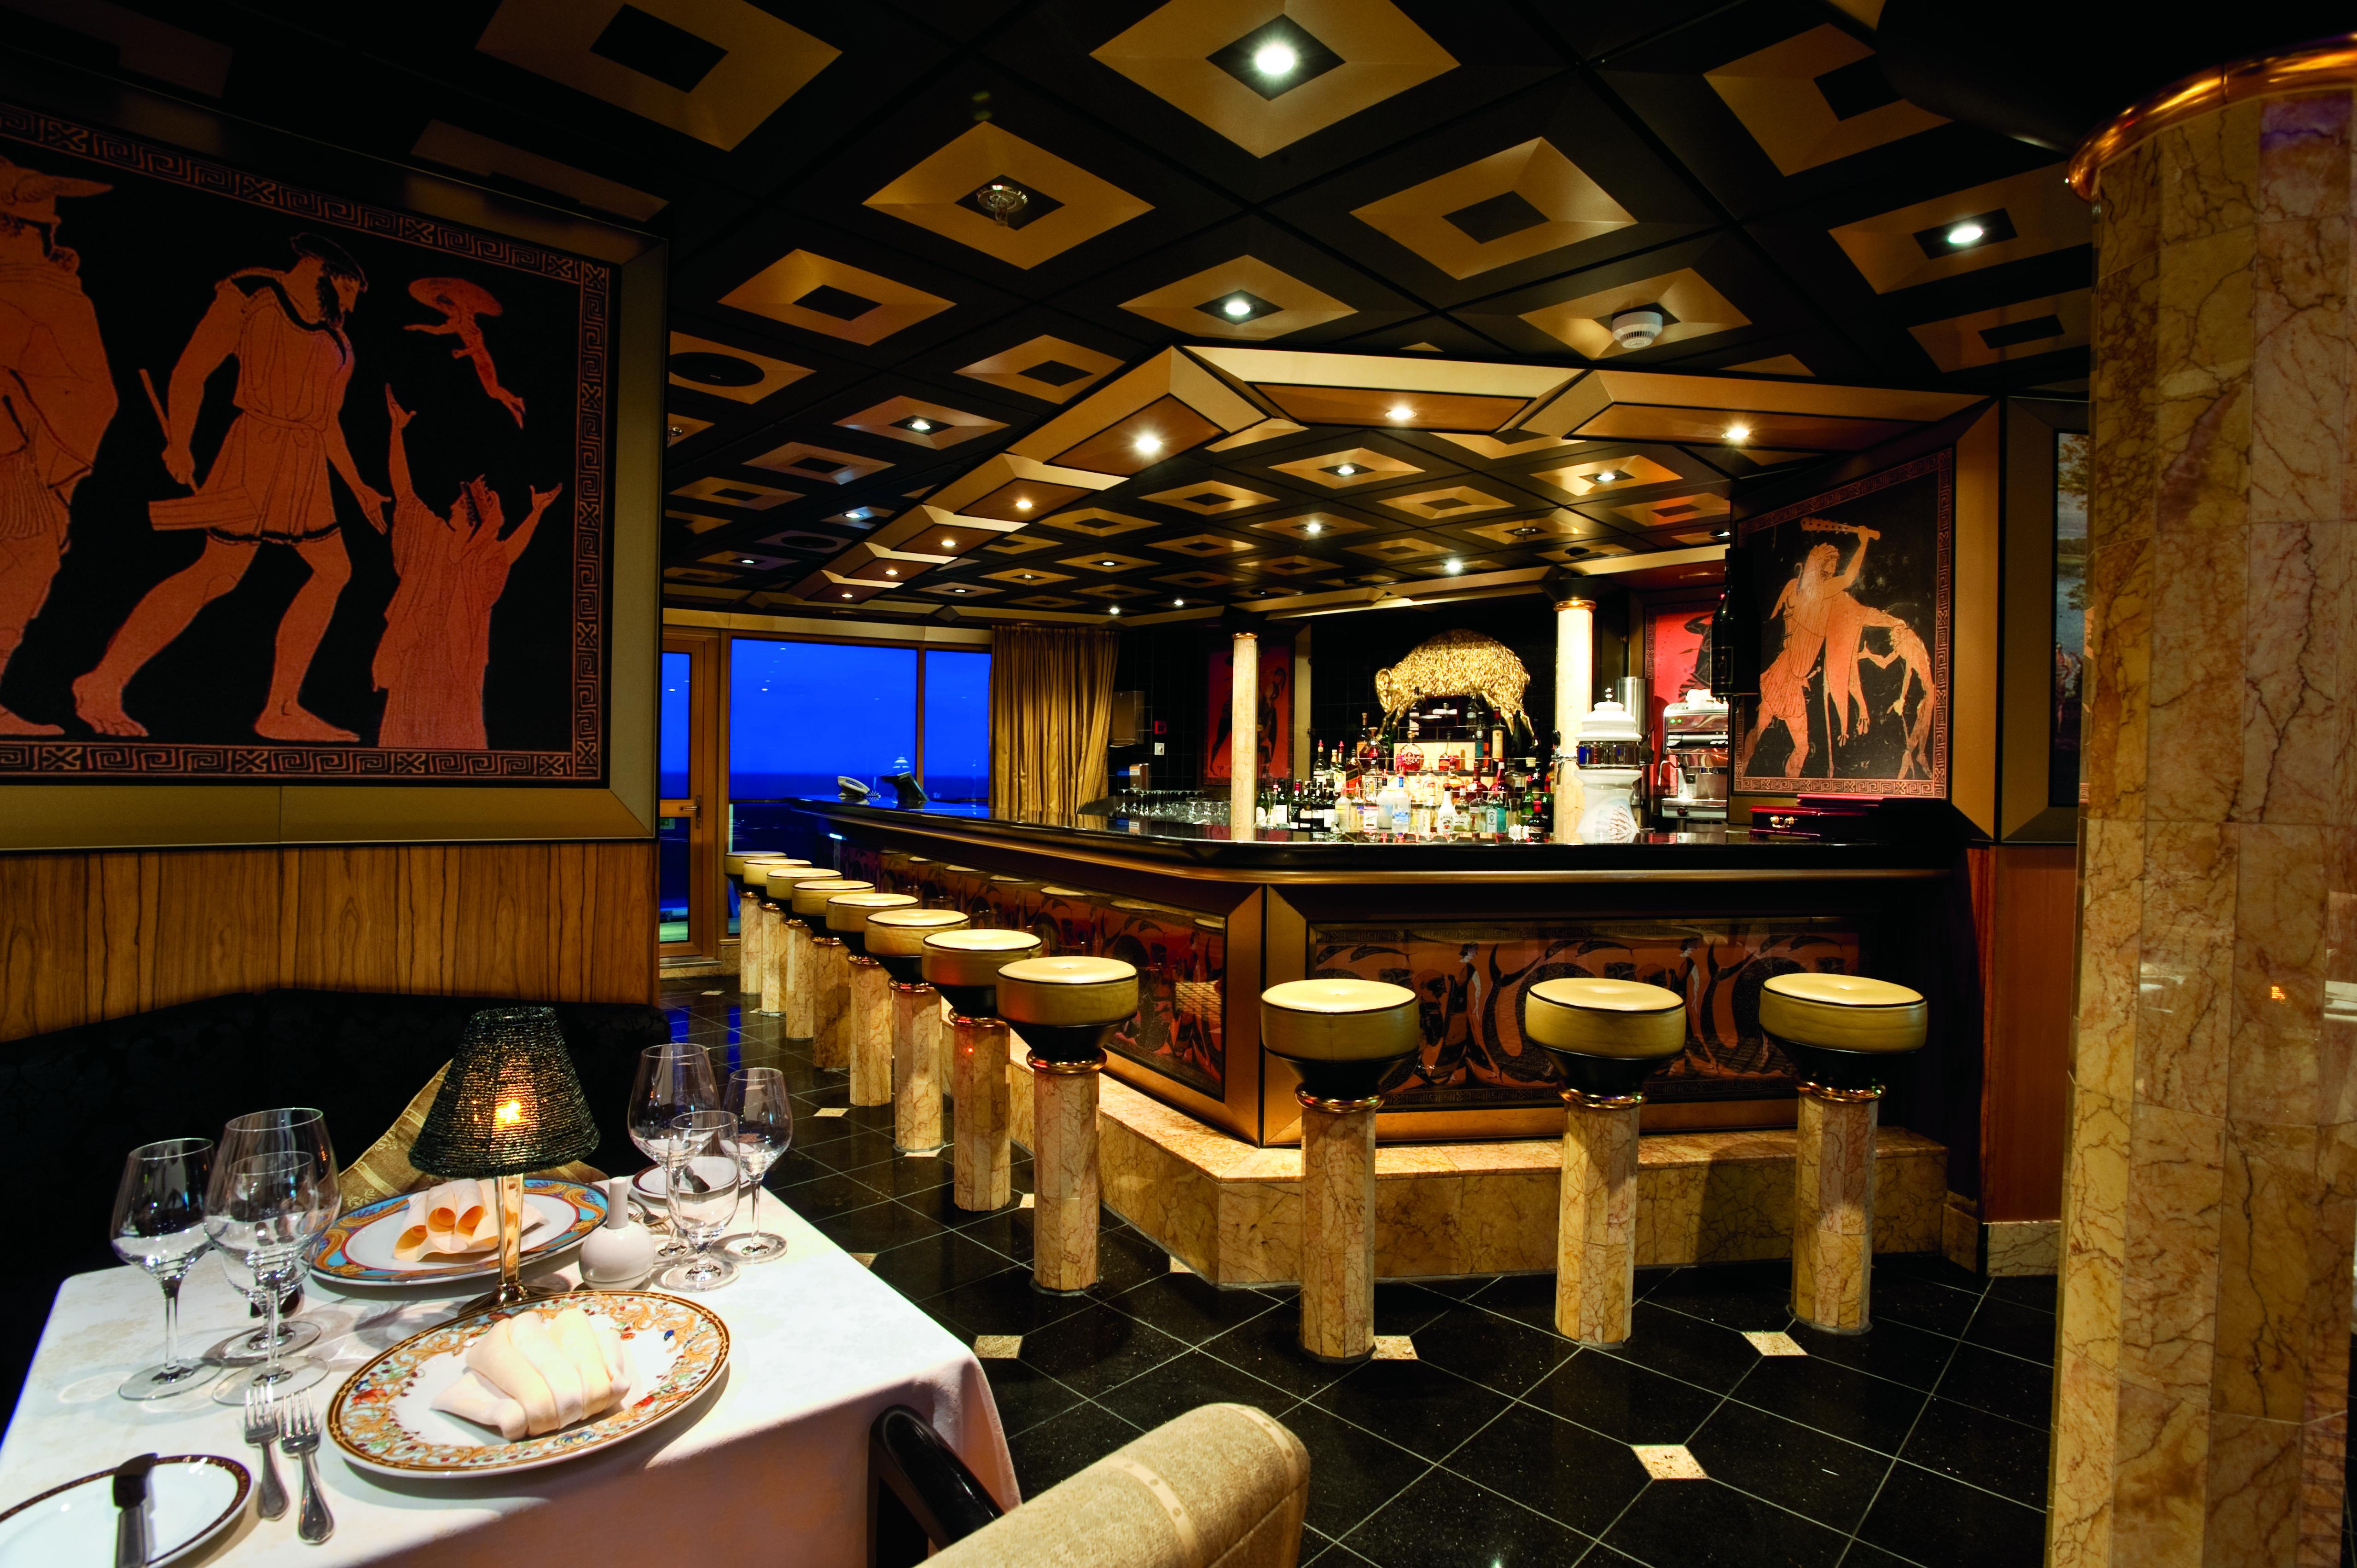 Carnival Legend Golden Fleece Dining Room 2.jpg